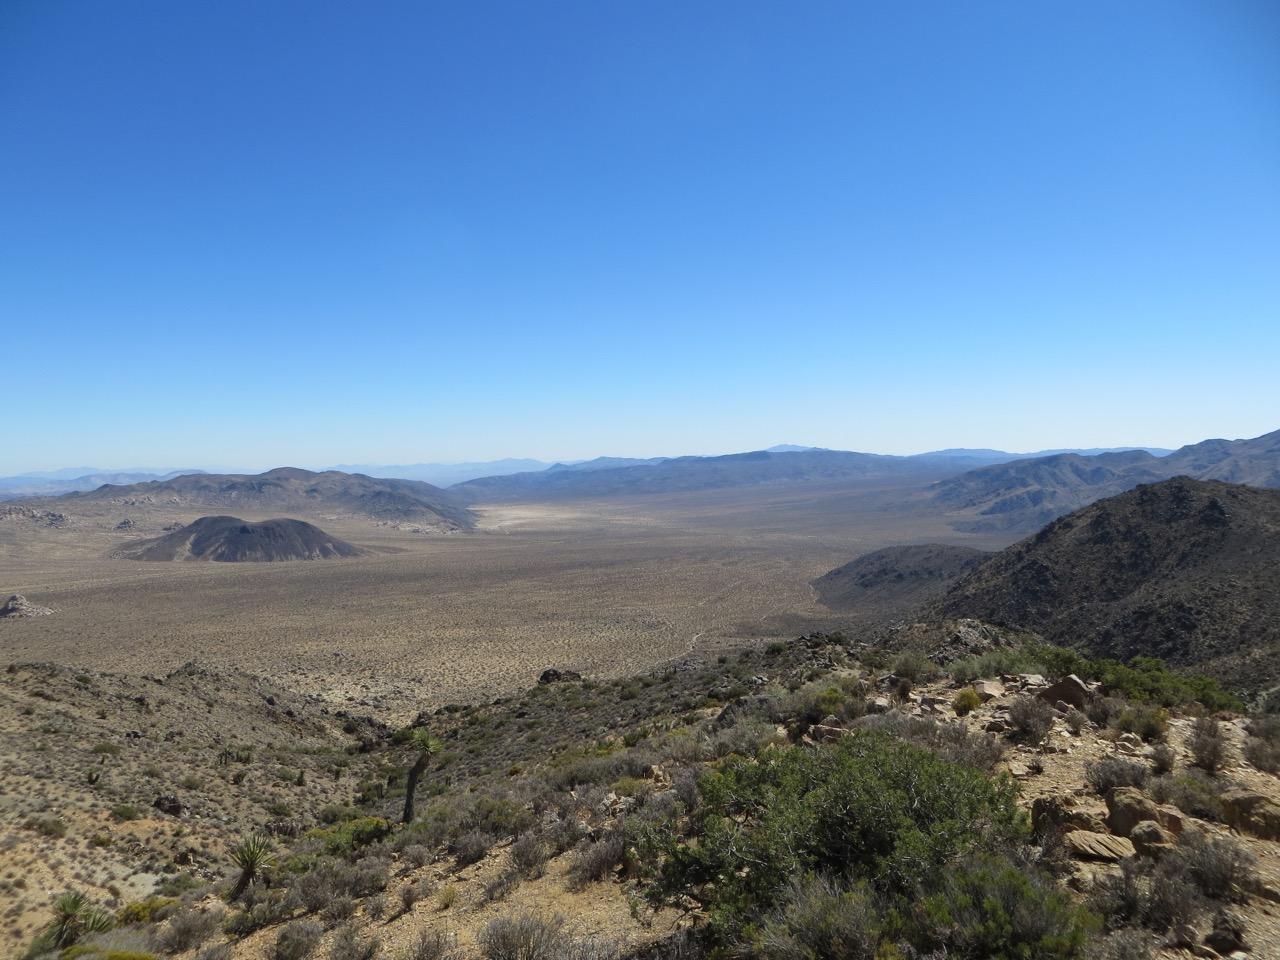 Large expanse of desert in Joshua Tree